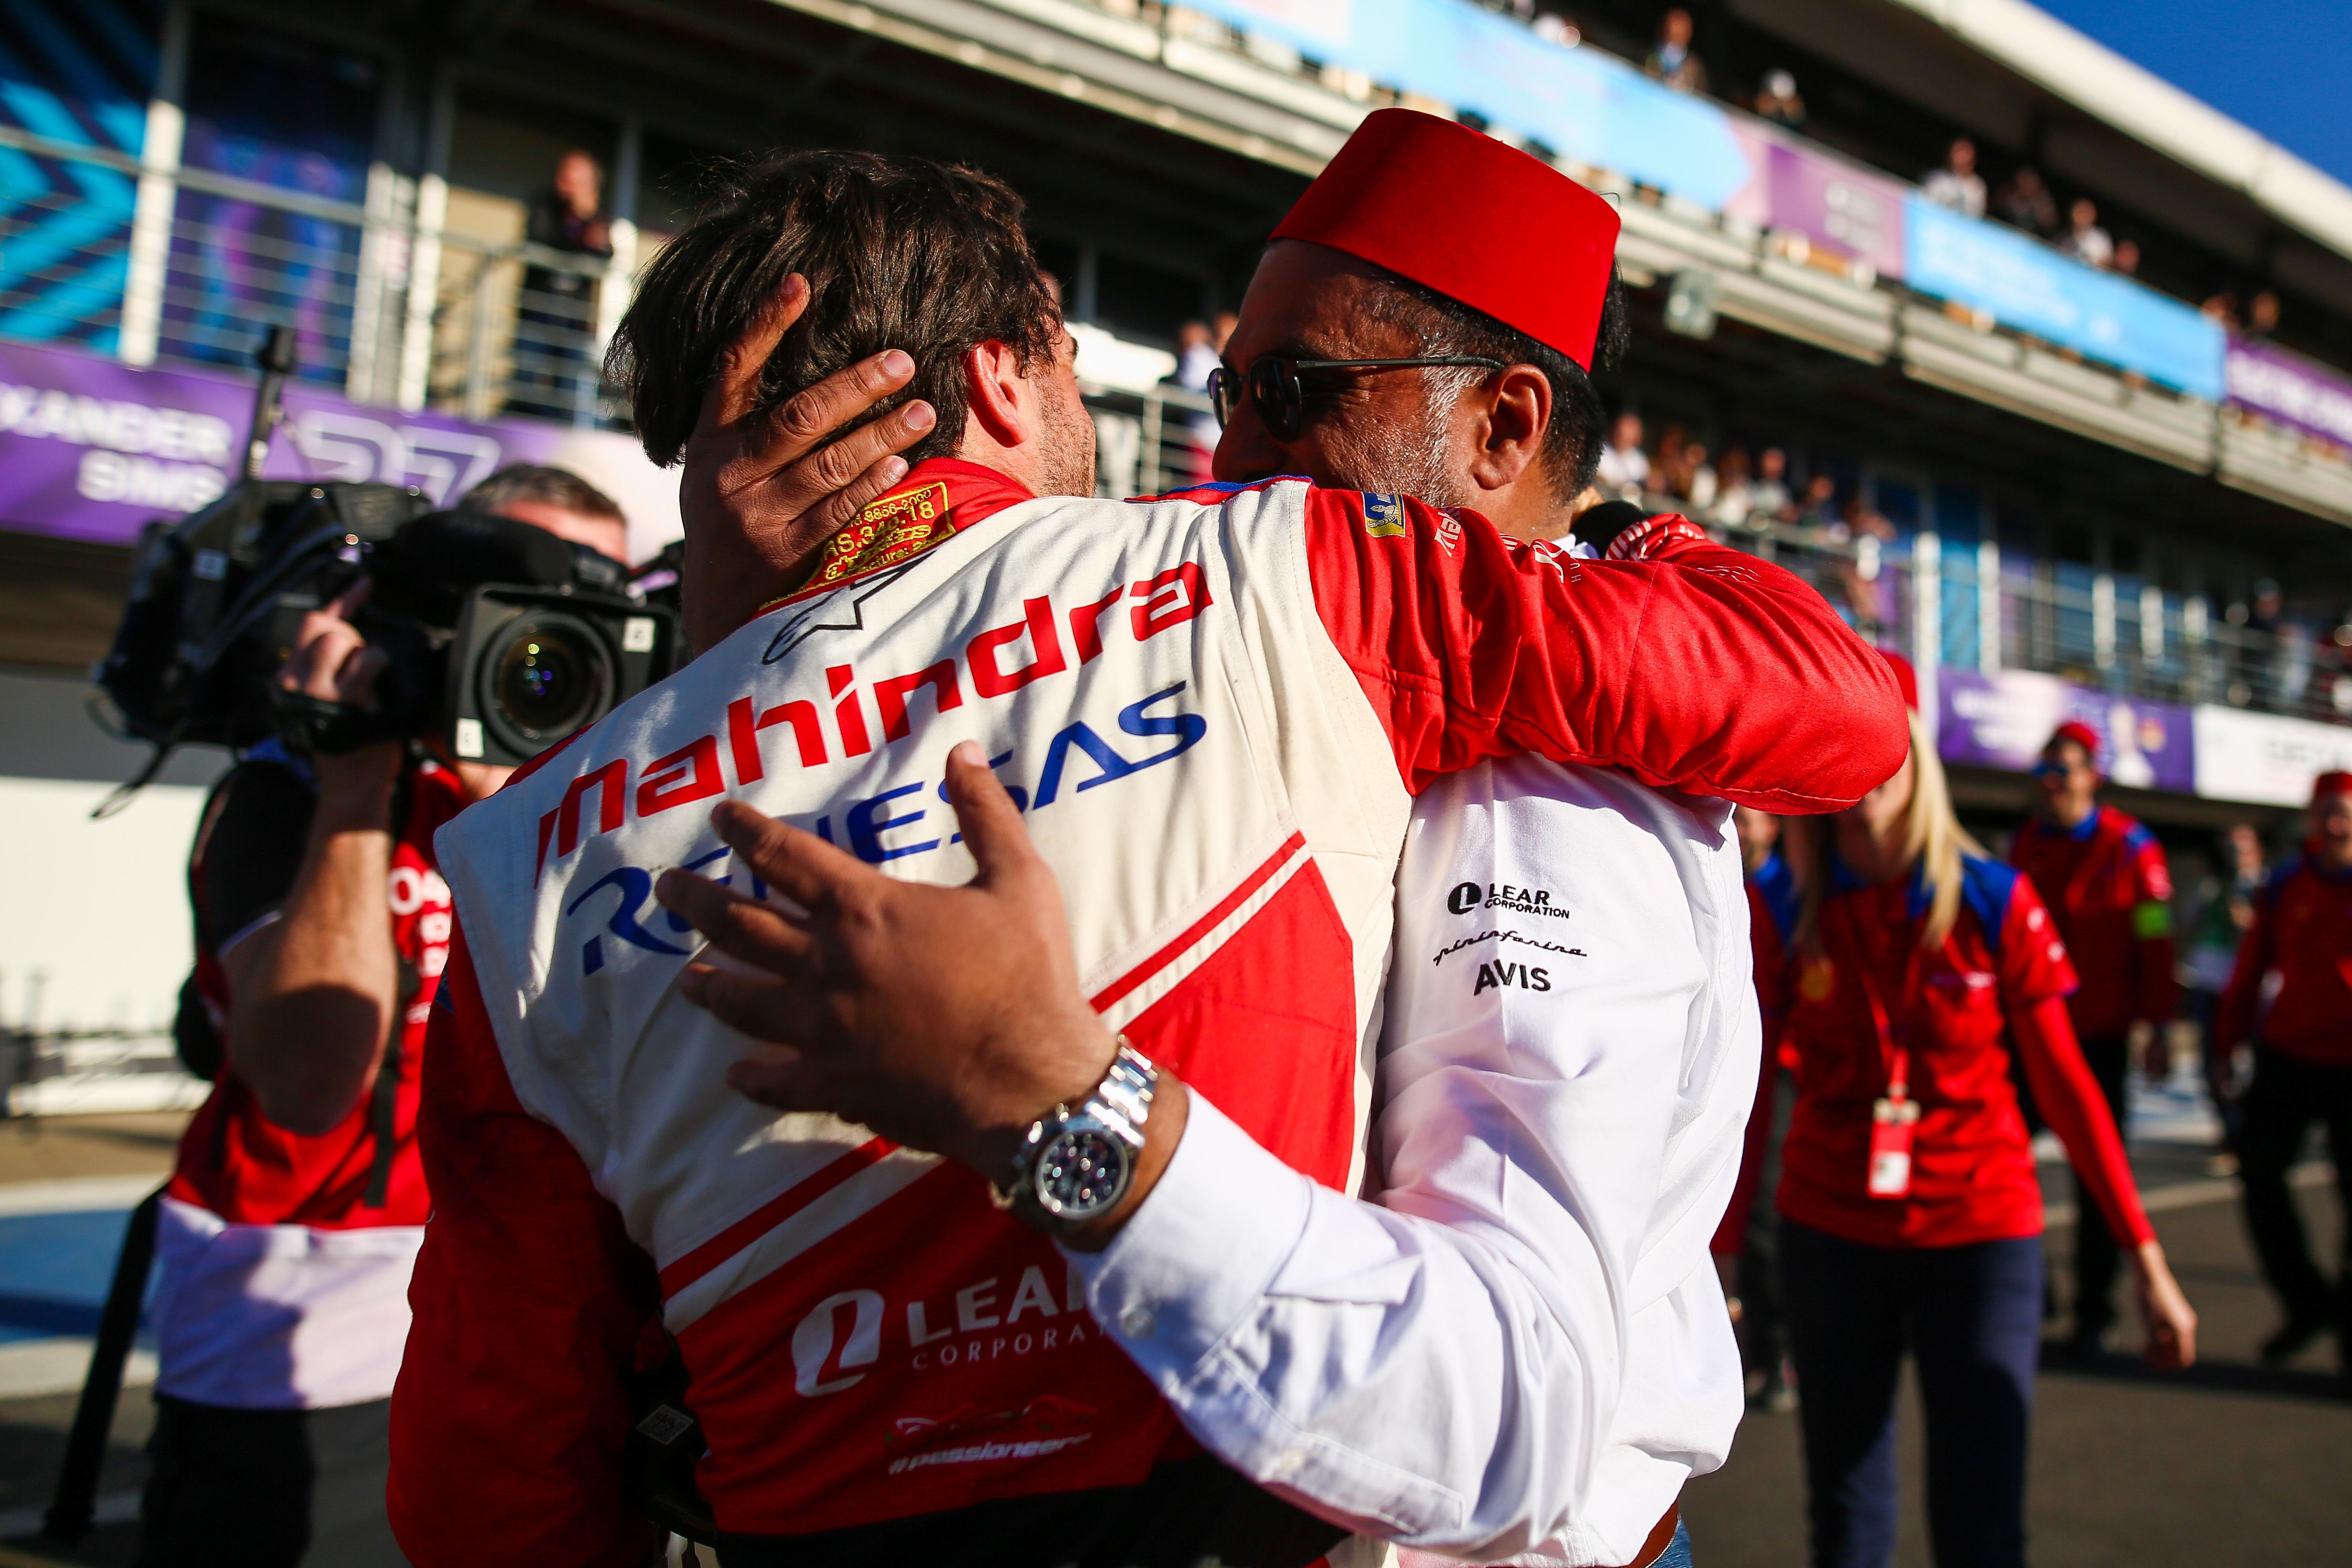 Jerome d'Ambrosio and Dilbagh Gill, Mahindra, Marrakesh Formula E